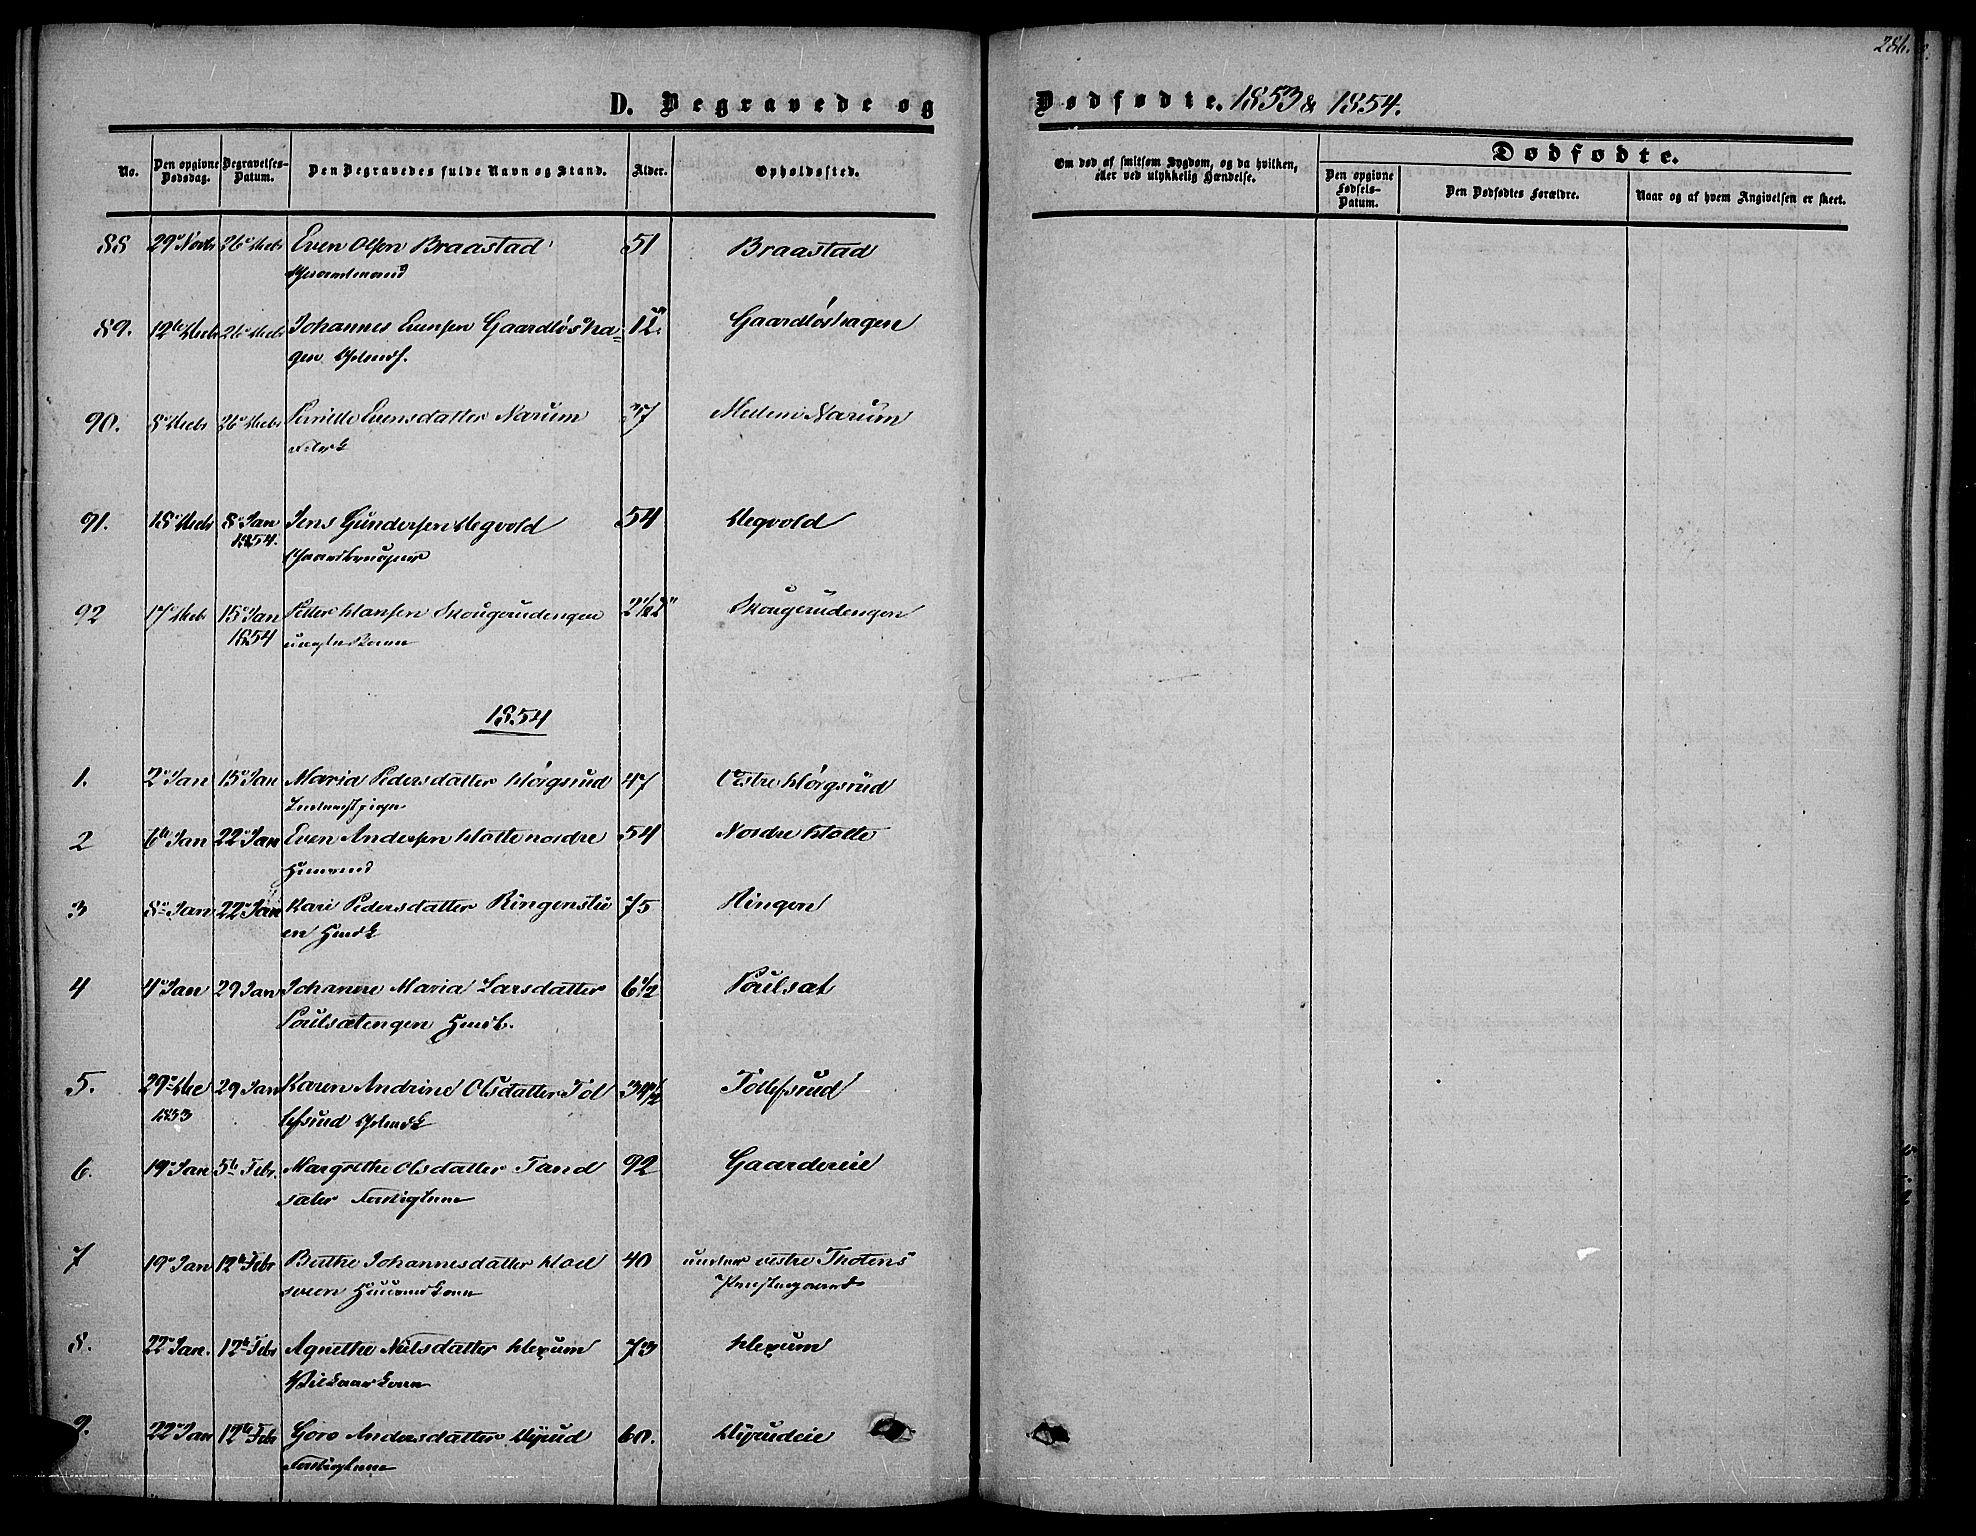 SAH, Vestre Toten prestekontor, H/Ha/Haa/L0005: Ministerialbok nr. 5, 1850-1855, s. 286